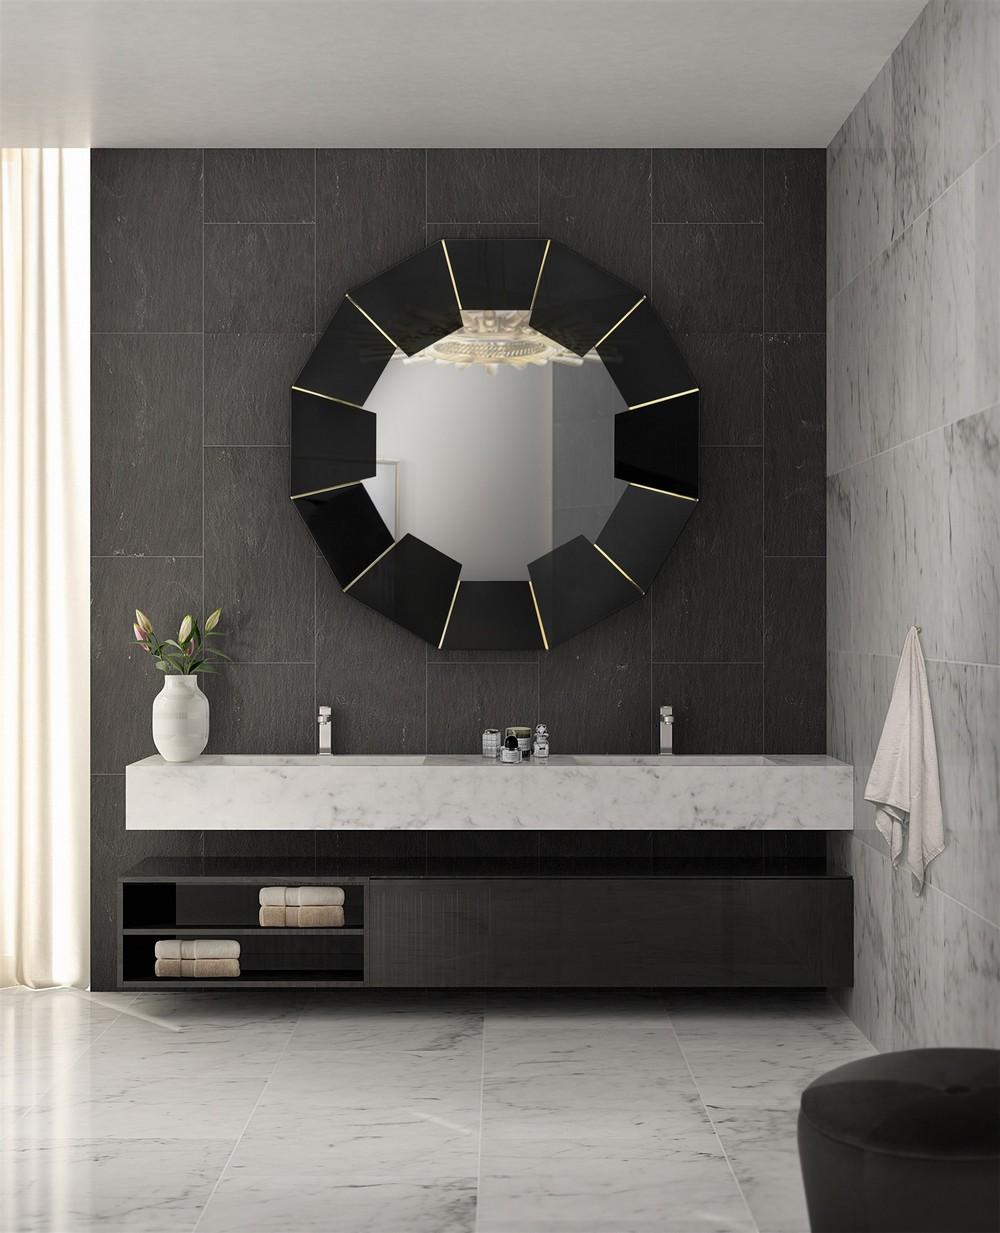 Bathroom Trends 8 Ingenious Design Ideas to Create a Stylish Interior_4 bathroom trends Bathroom Trends: 8 Ingenious Design Ideas to Create a Stylish Interior Bathroom Trends 8 Ingenious Design Ideas to Create a Stylish Interior 4